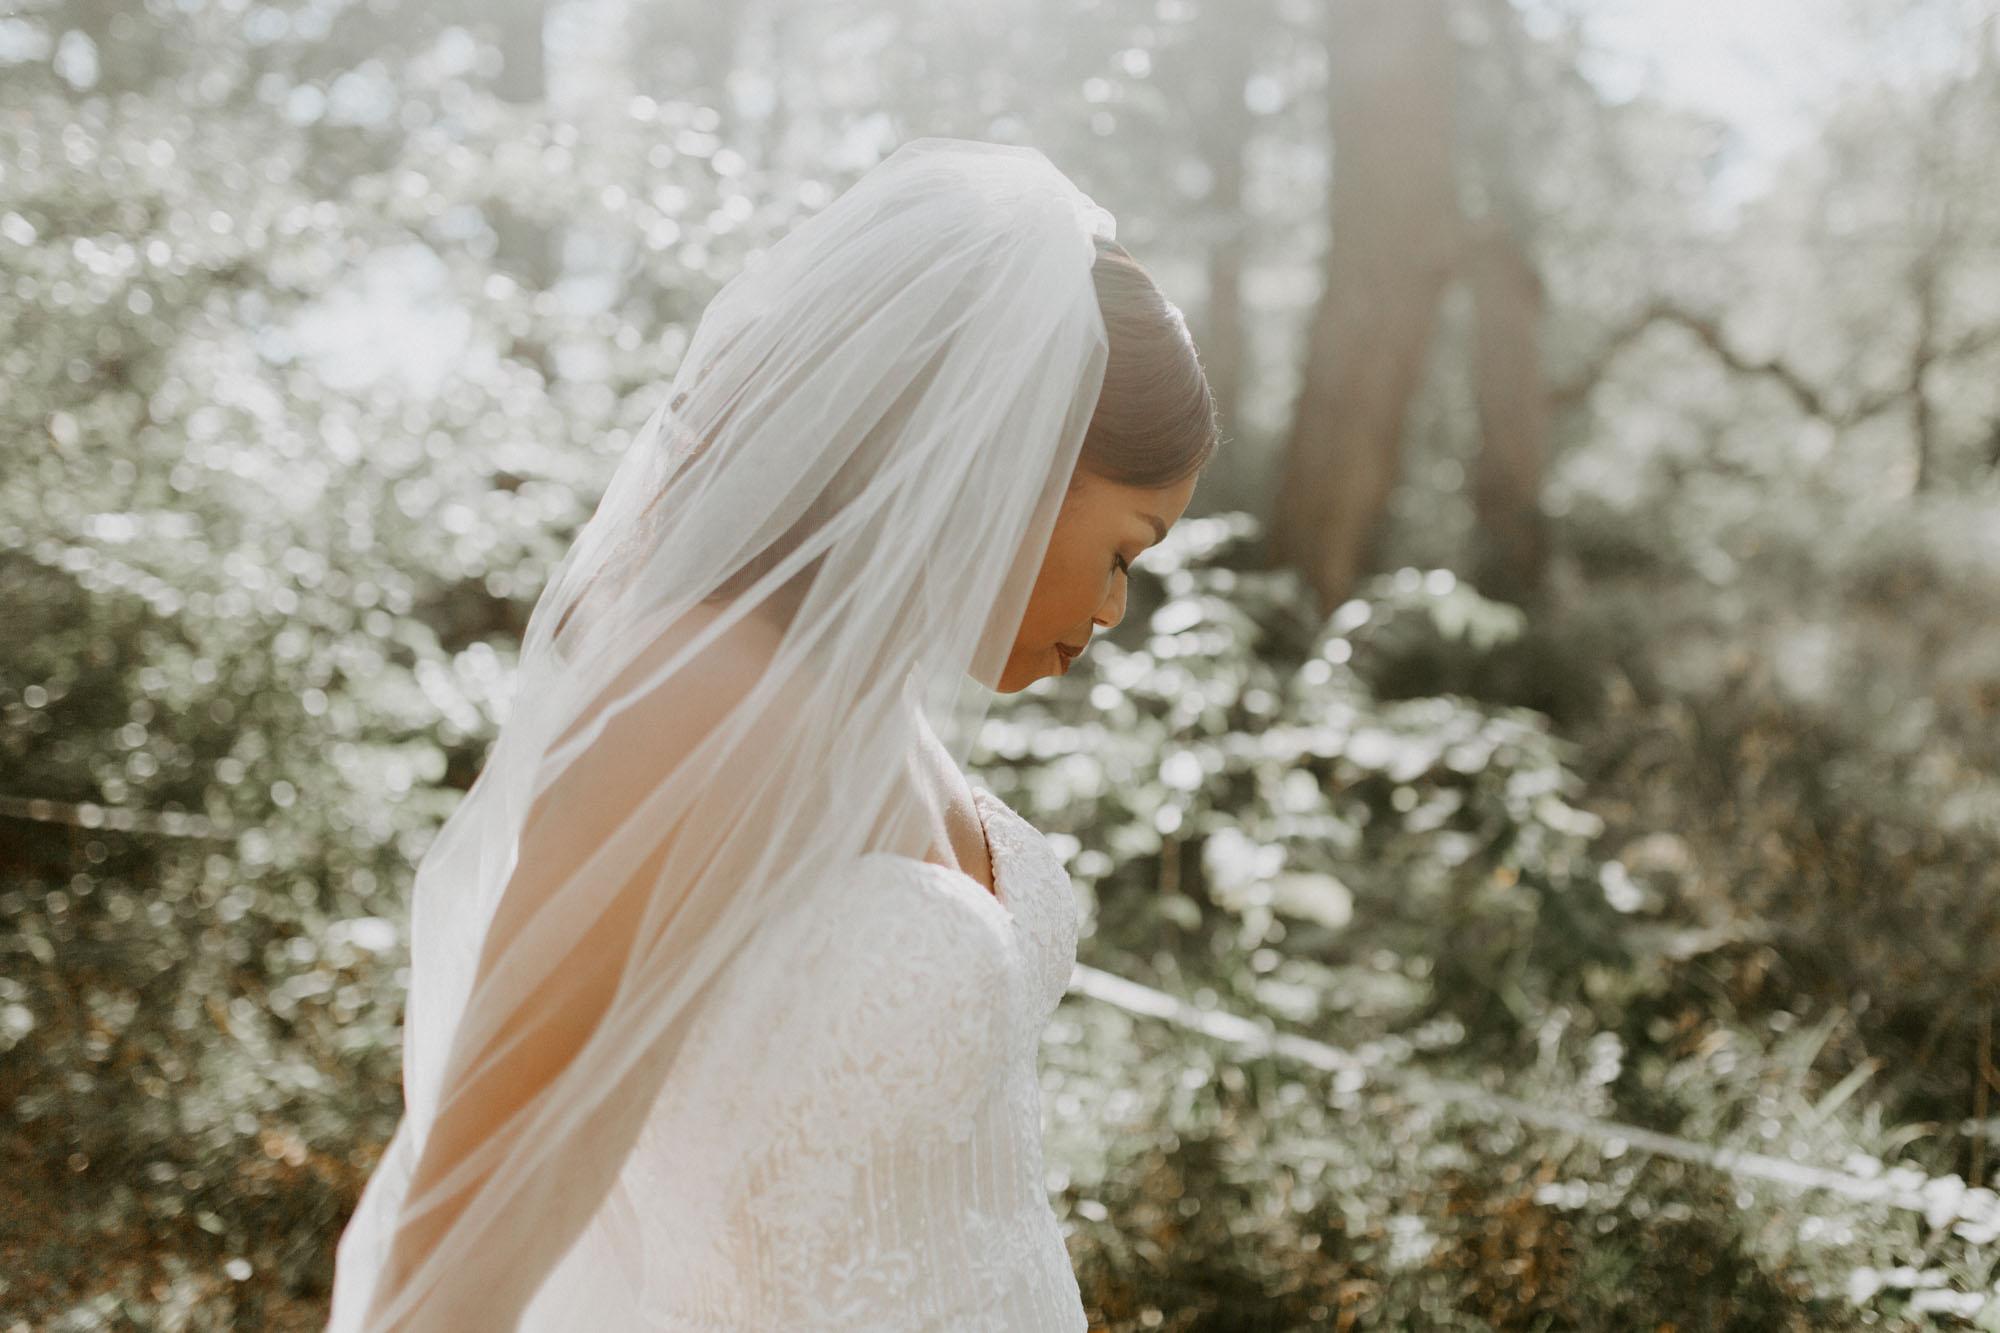 prairie_glass_house_wedding_champaign_wright_photographs_simon_0055.jpg